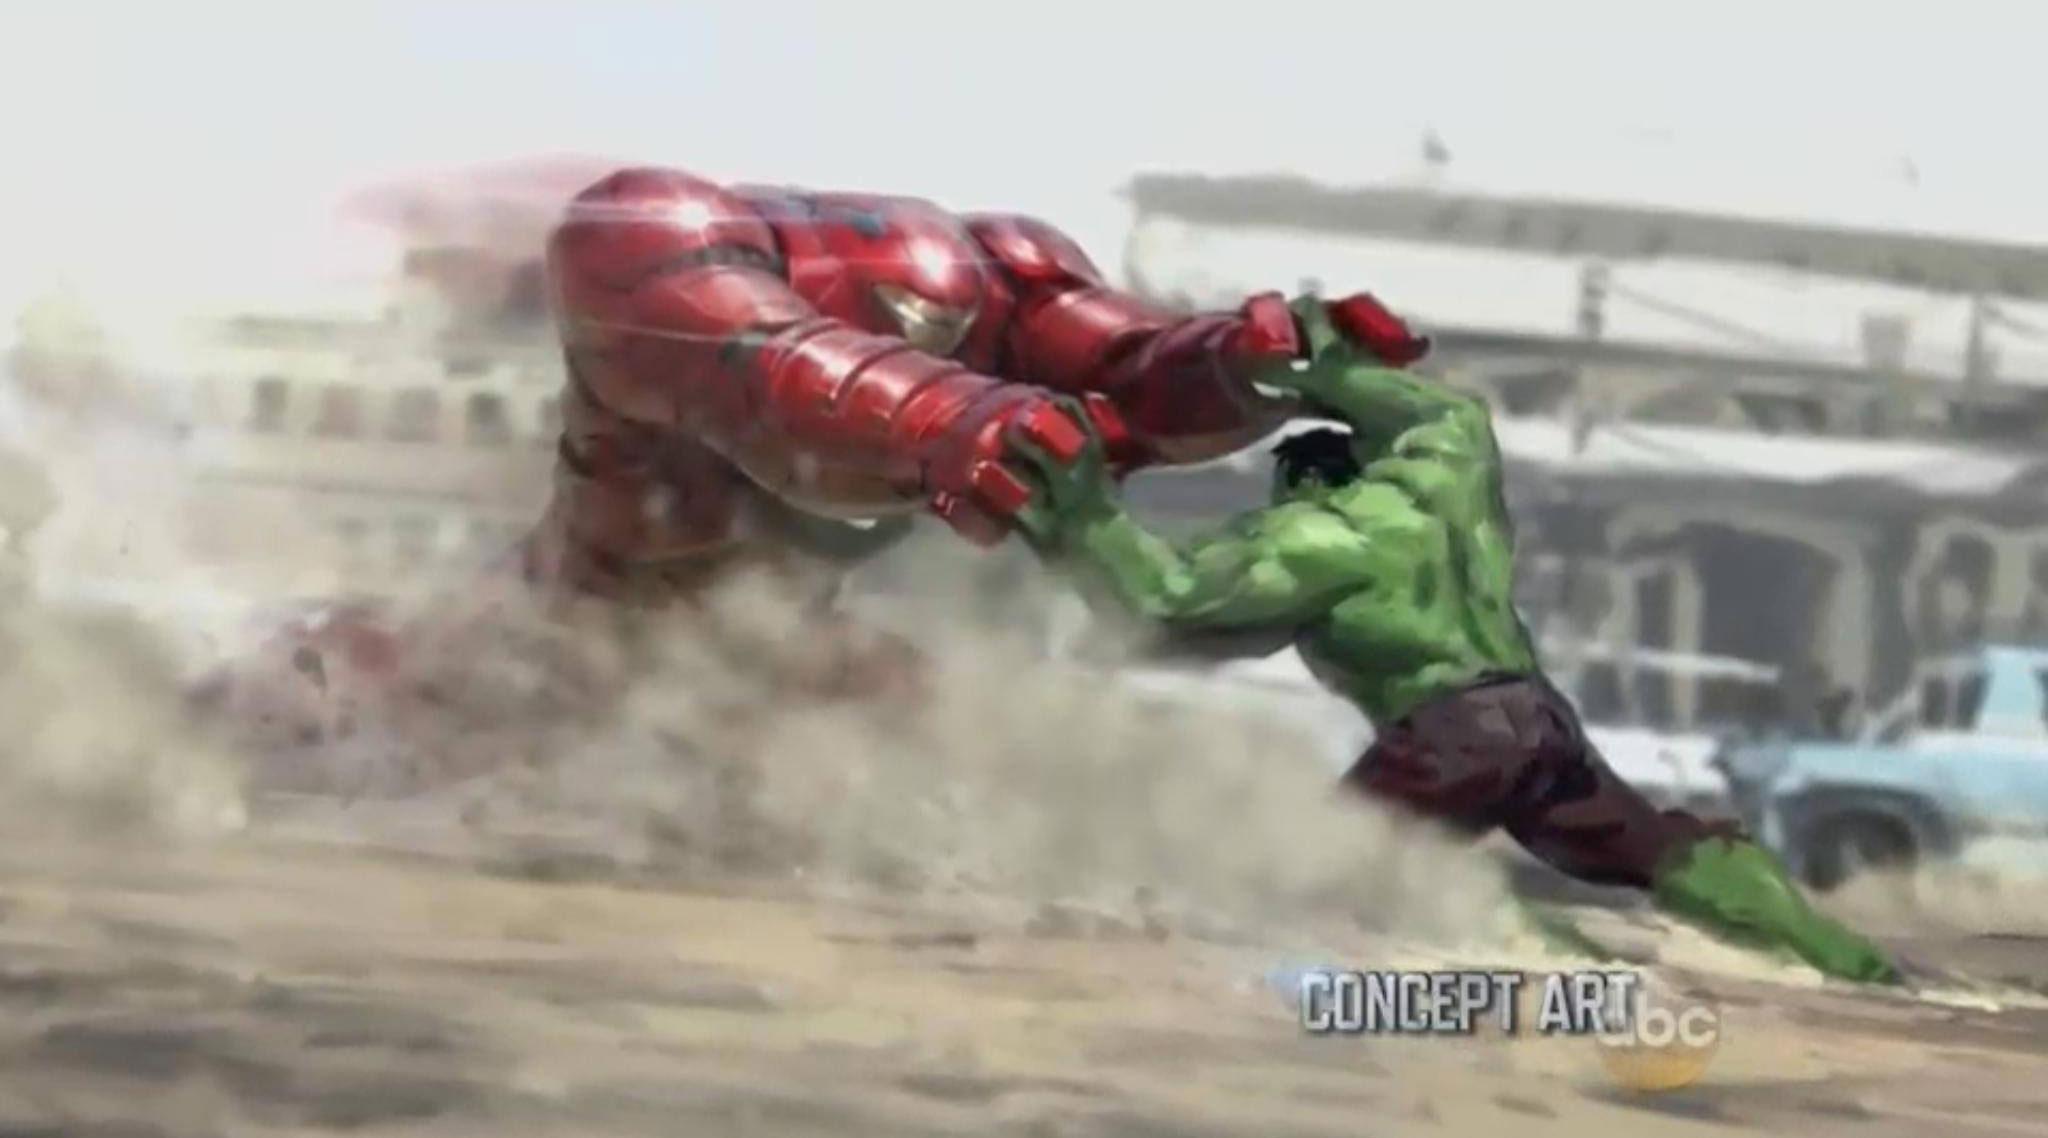 [CINEMA][Topico Oficial] Avengers: Age of Ultron - Visual do Visão! - Página 22 Hulkbuster_Concept_Art_for_Avengers_Age_of_Ultron